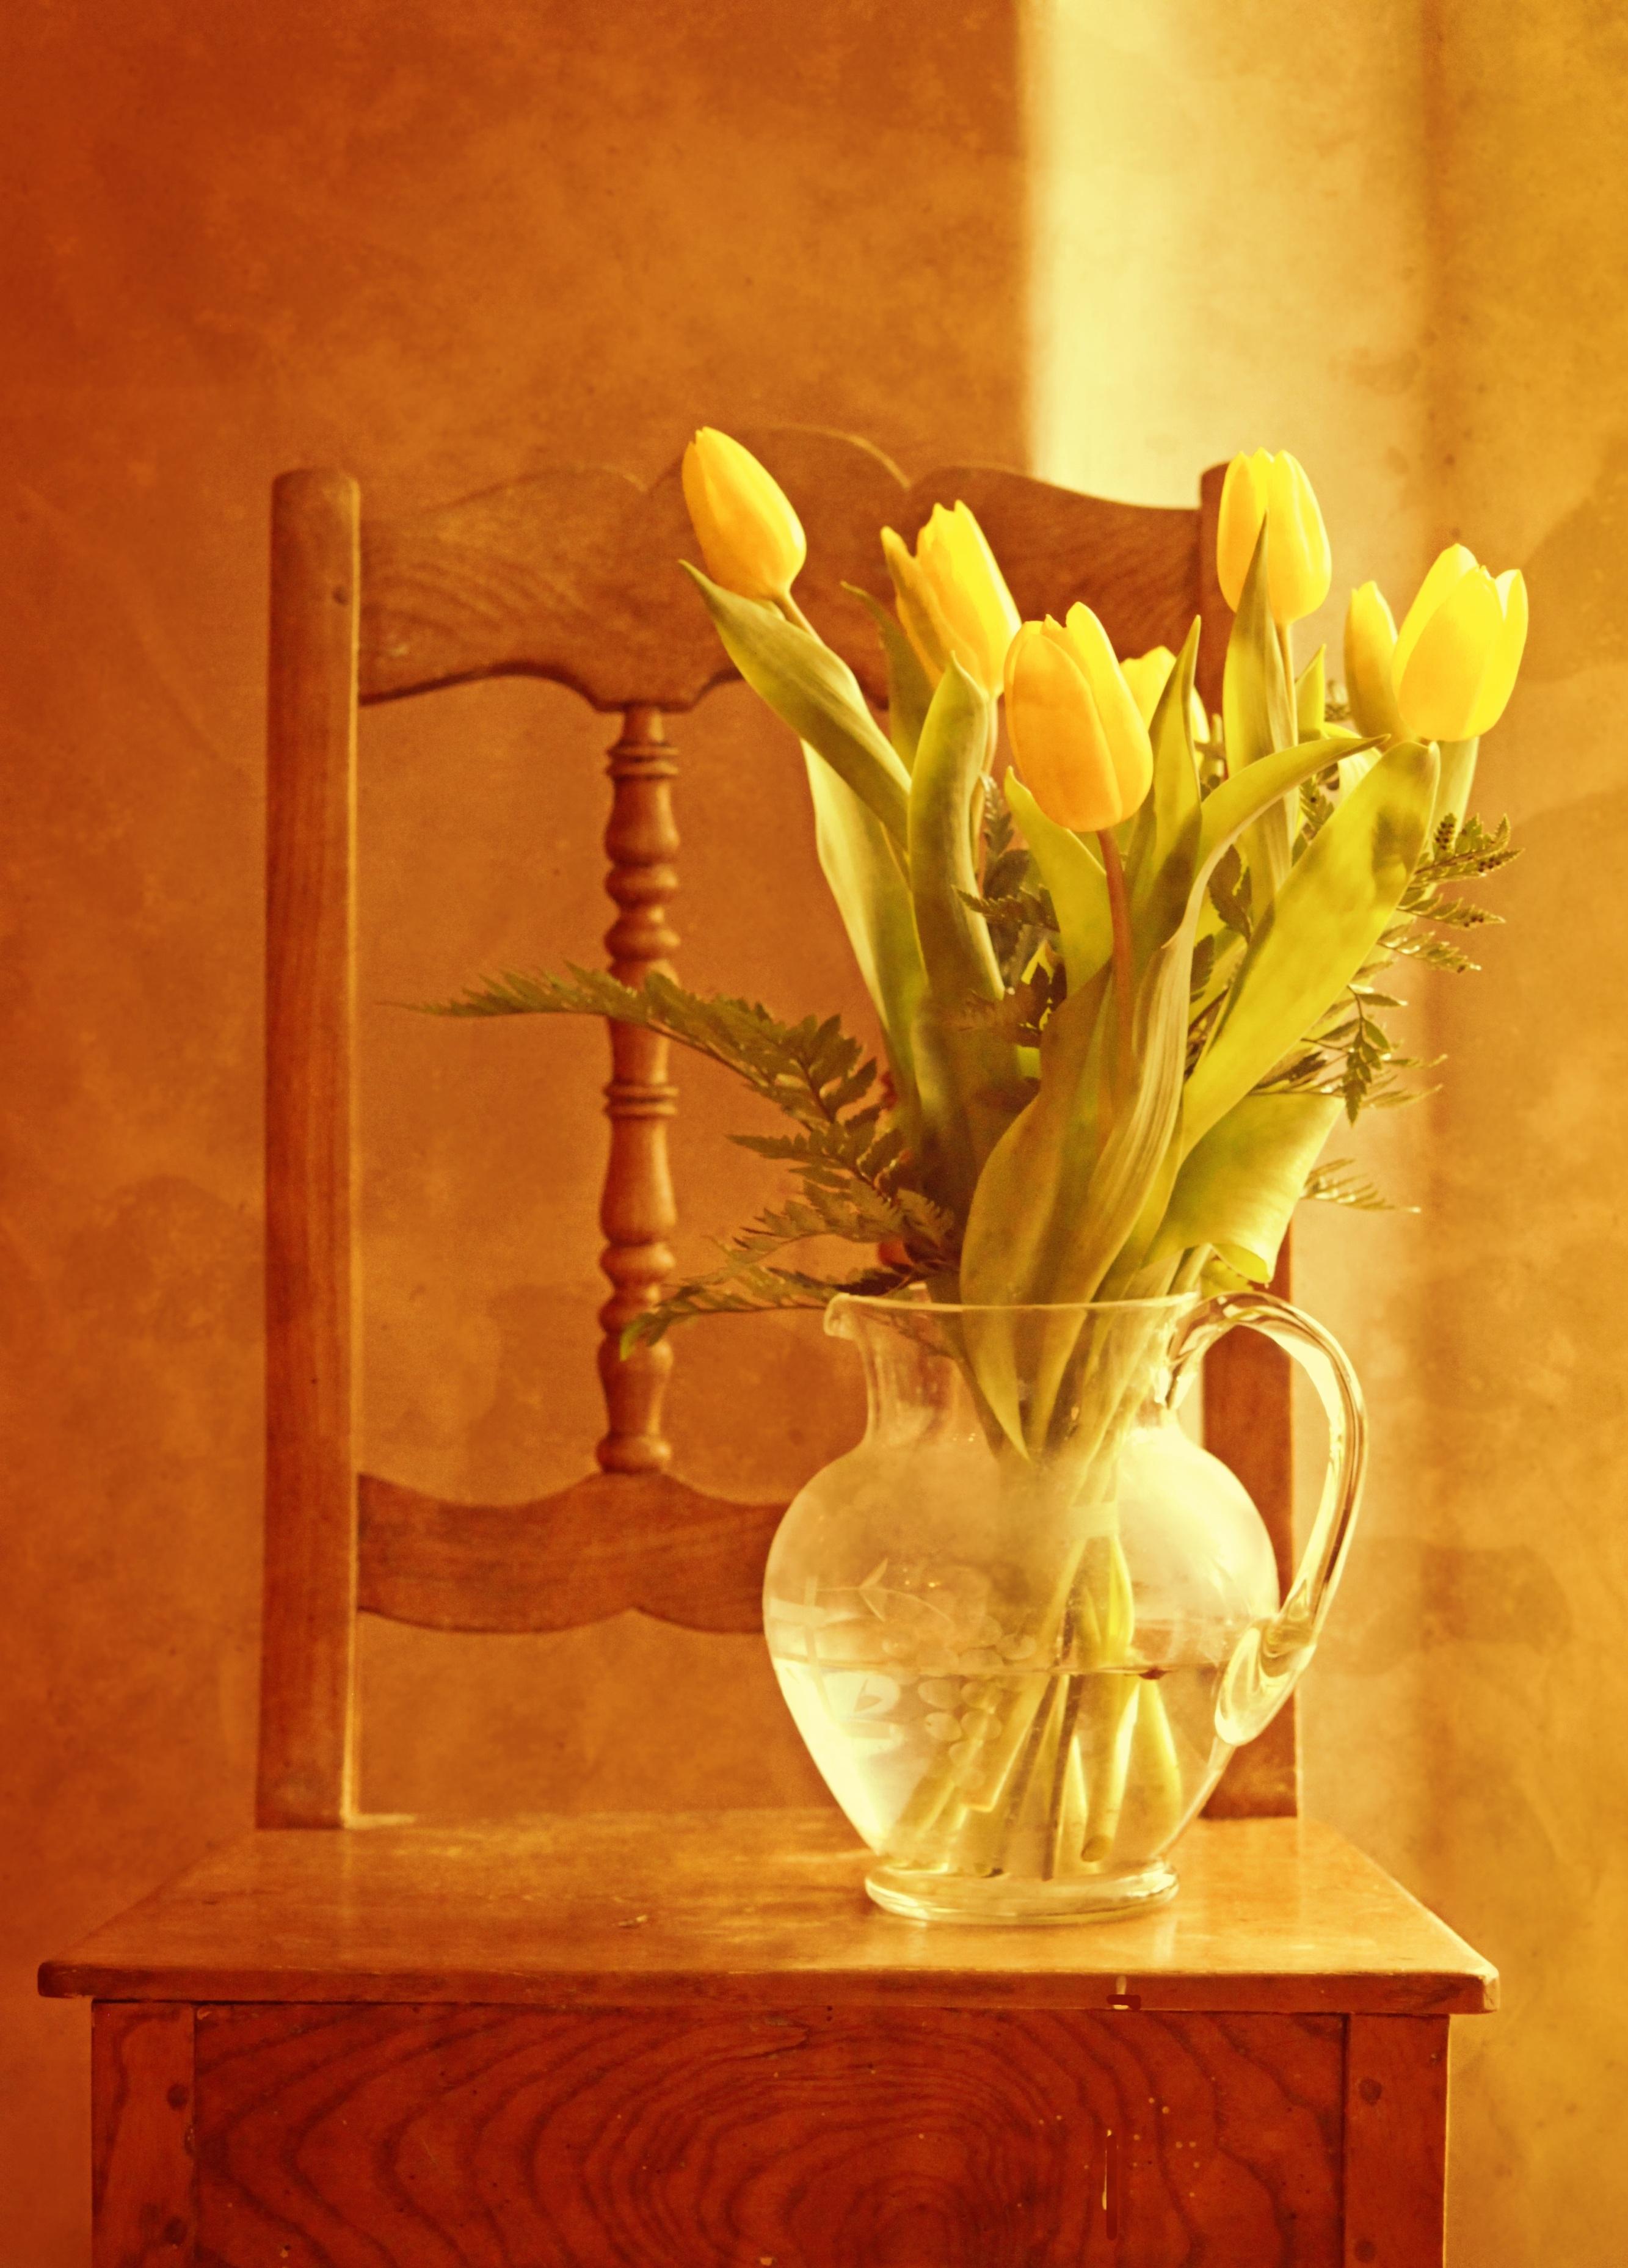 Free stock photos of flower vase pexels free stock photo of wood light romantic flowers reviewsmspy